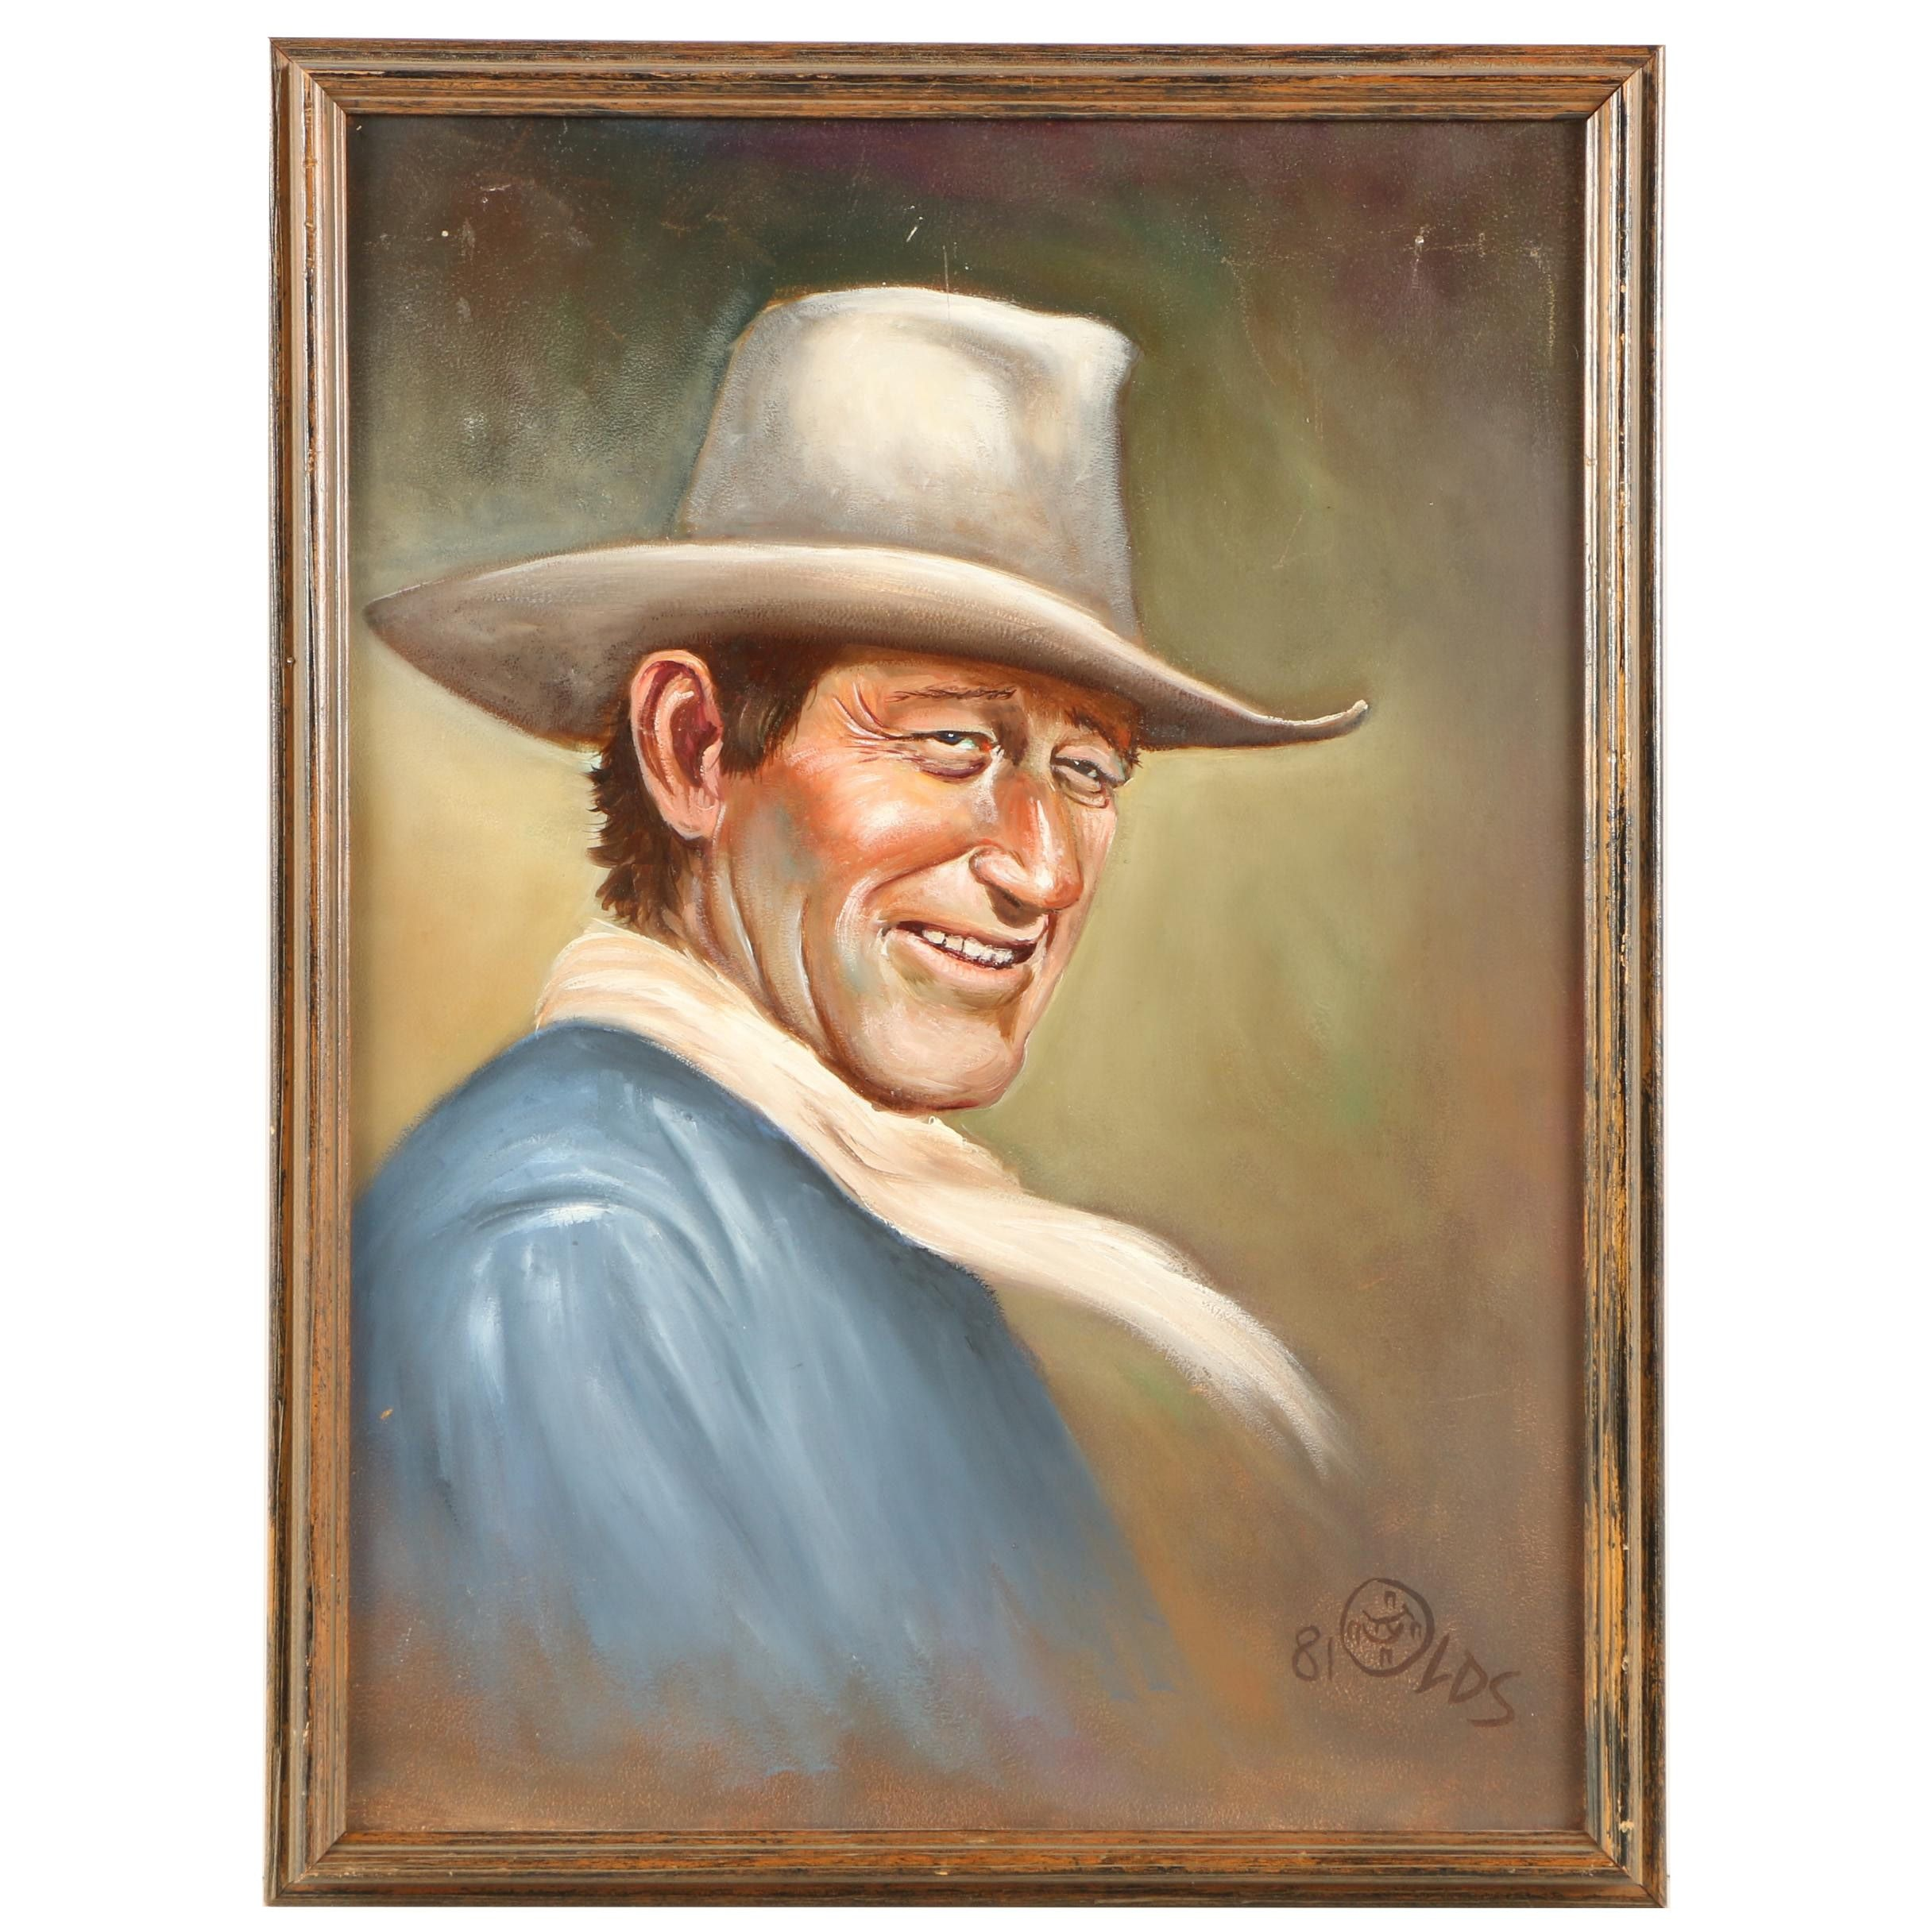 Fred Olds Oil Painting of John Wayne